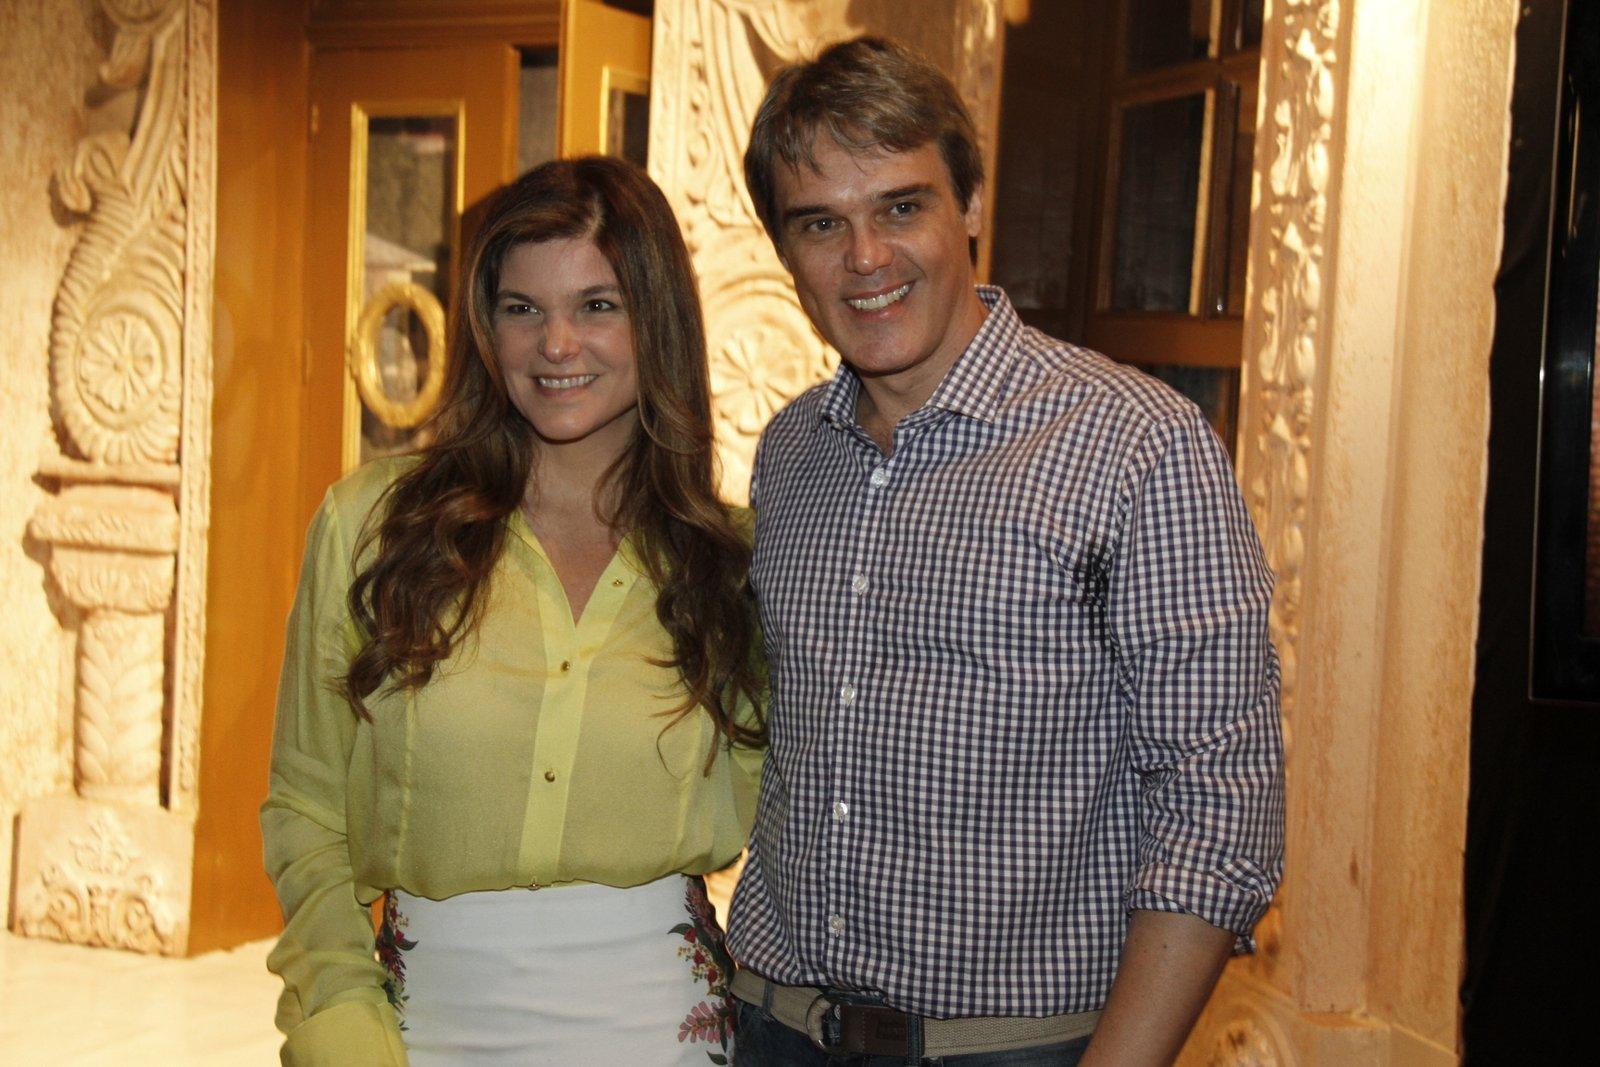 Cristiana Oliveira e Dalton Vigh